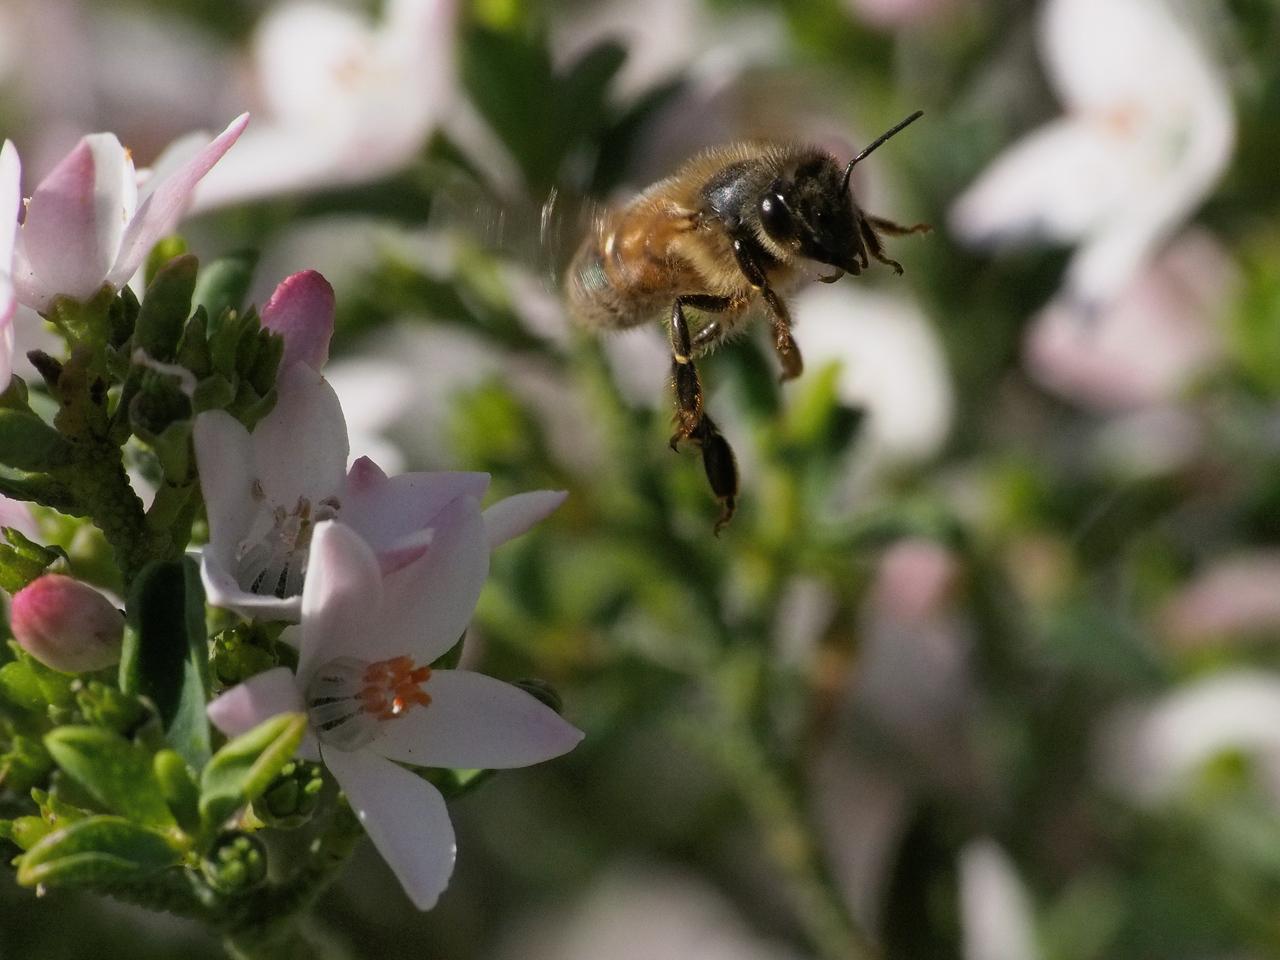 20130908_1448_2100 Kew Baptist bee